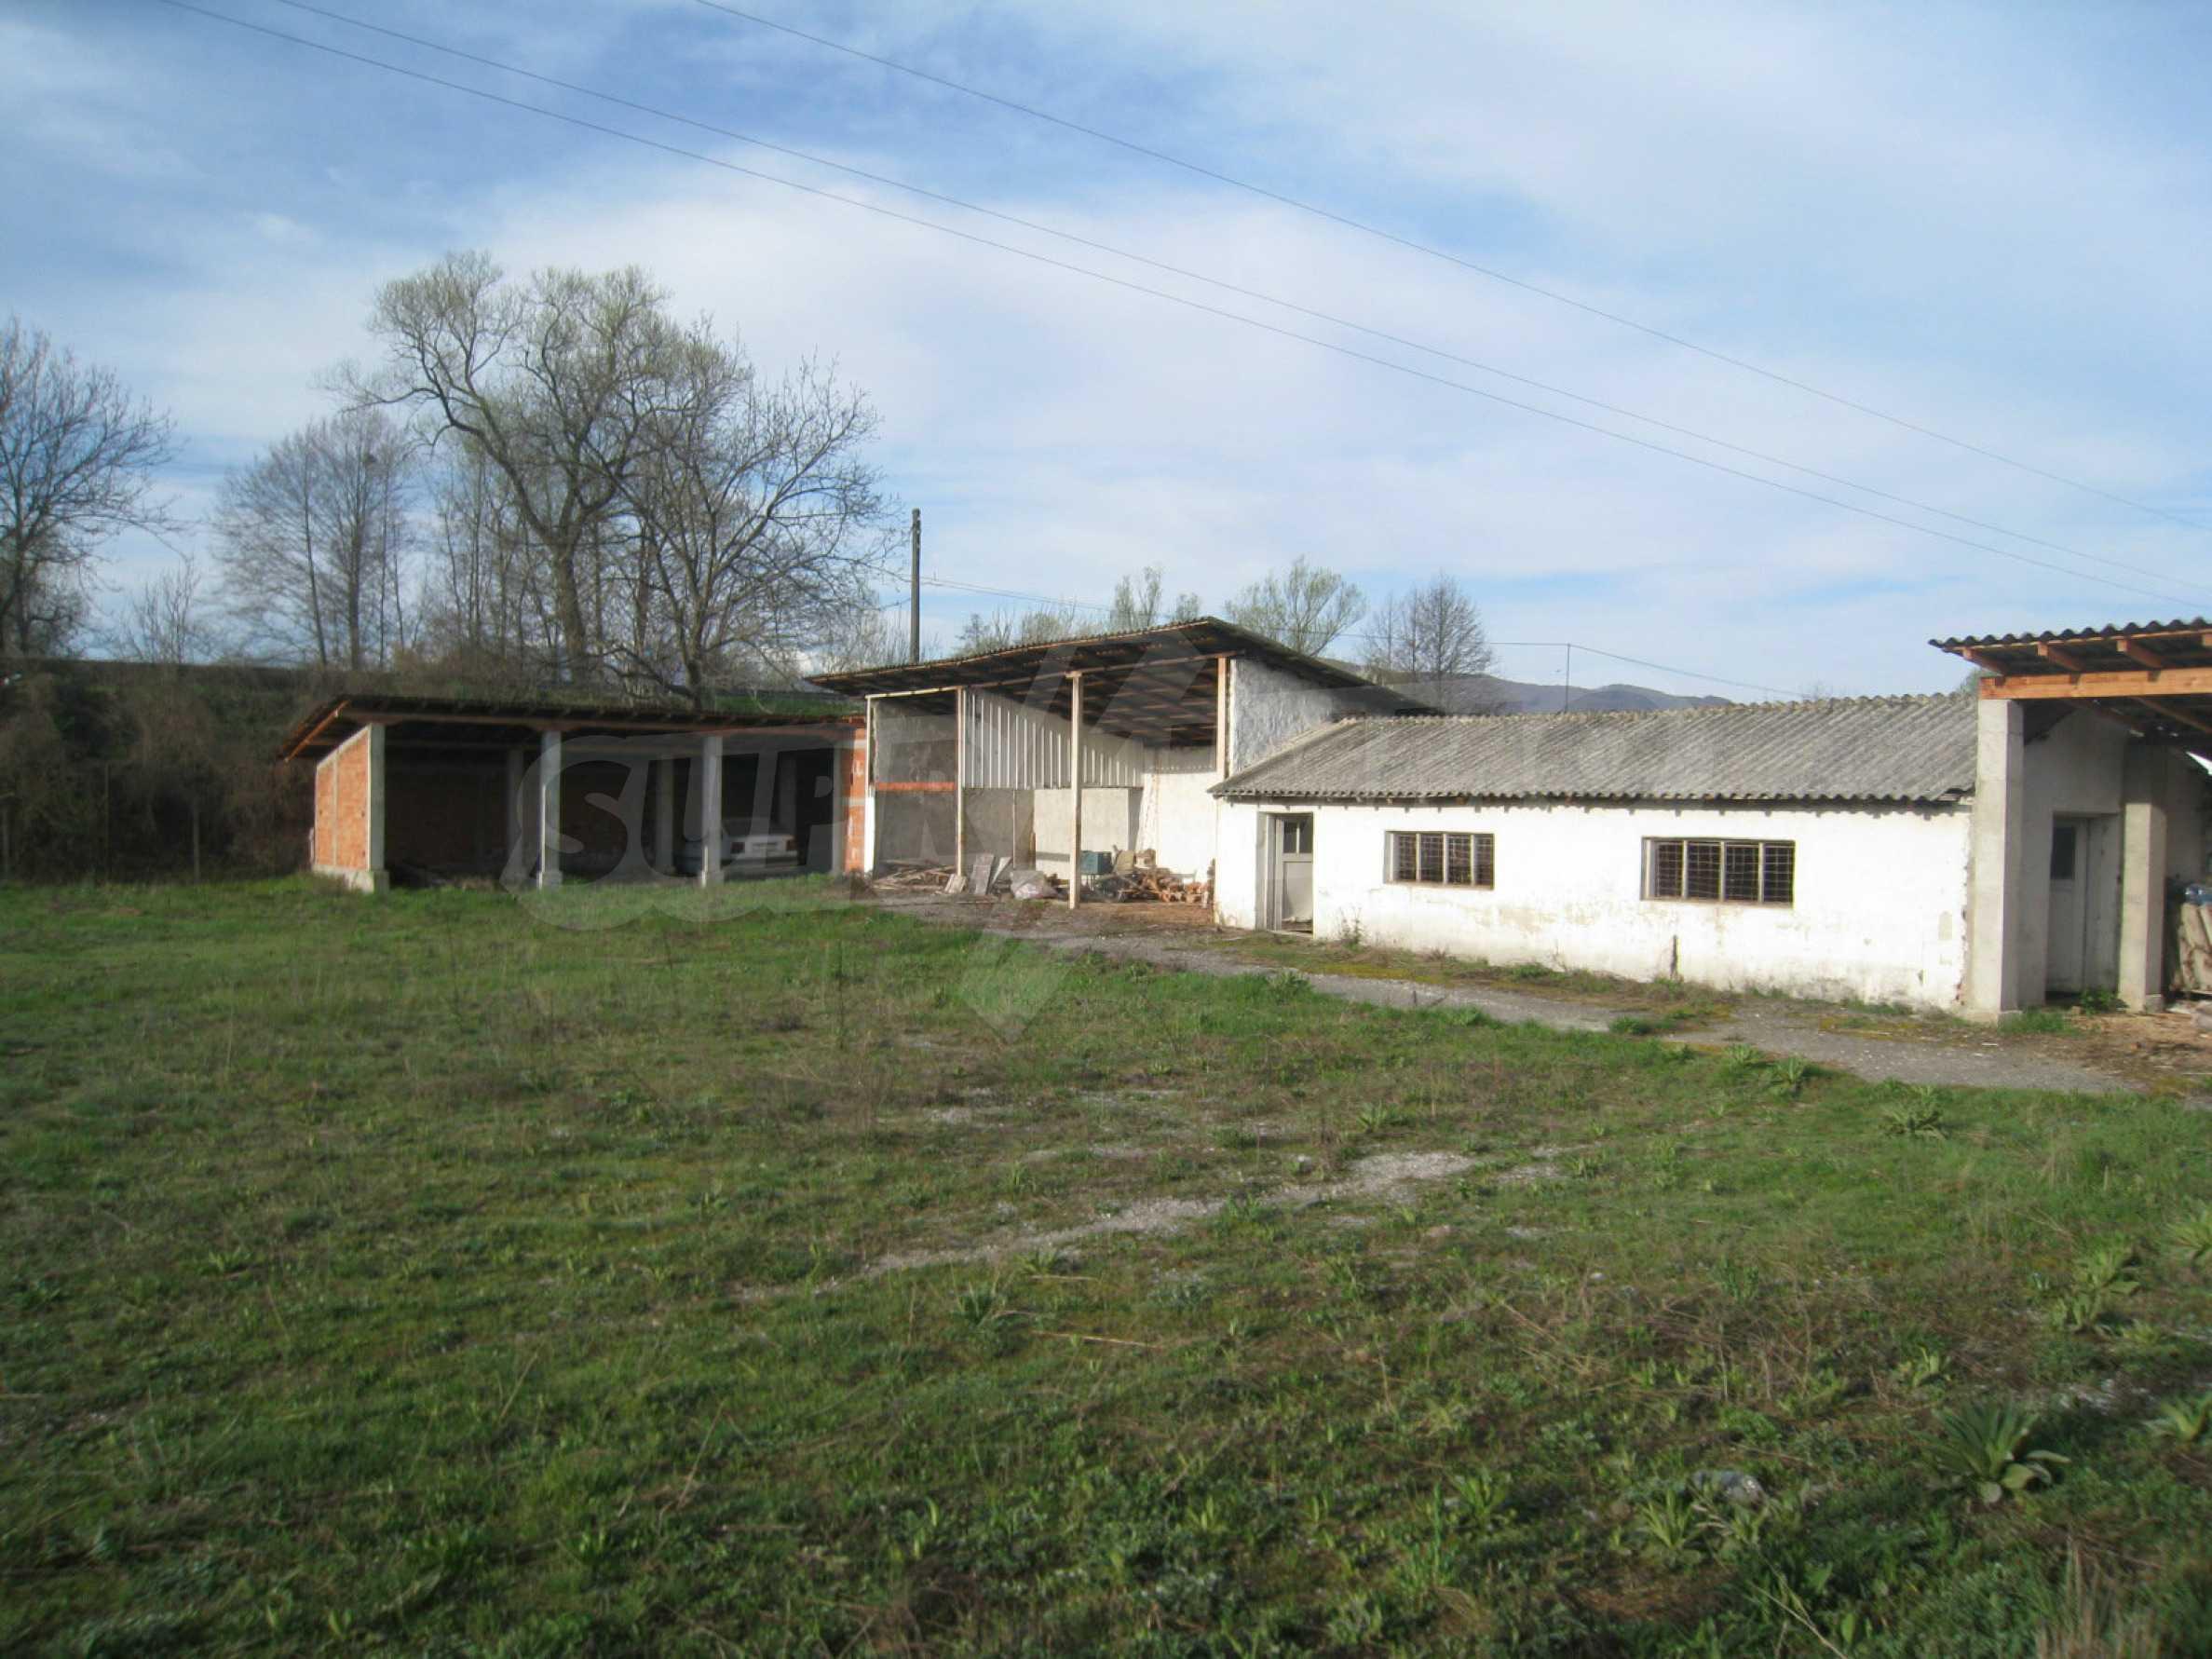 Fishpond, warehouses, residential areas and asphalt ground near Montana 32